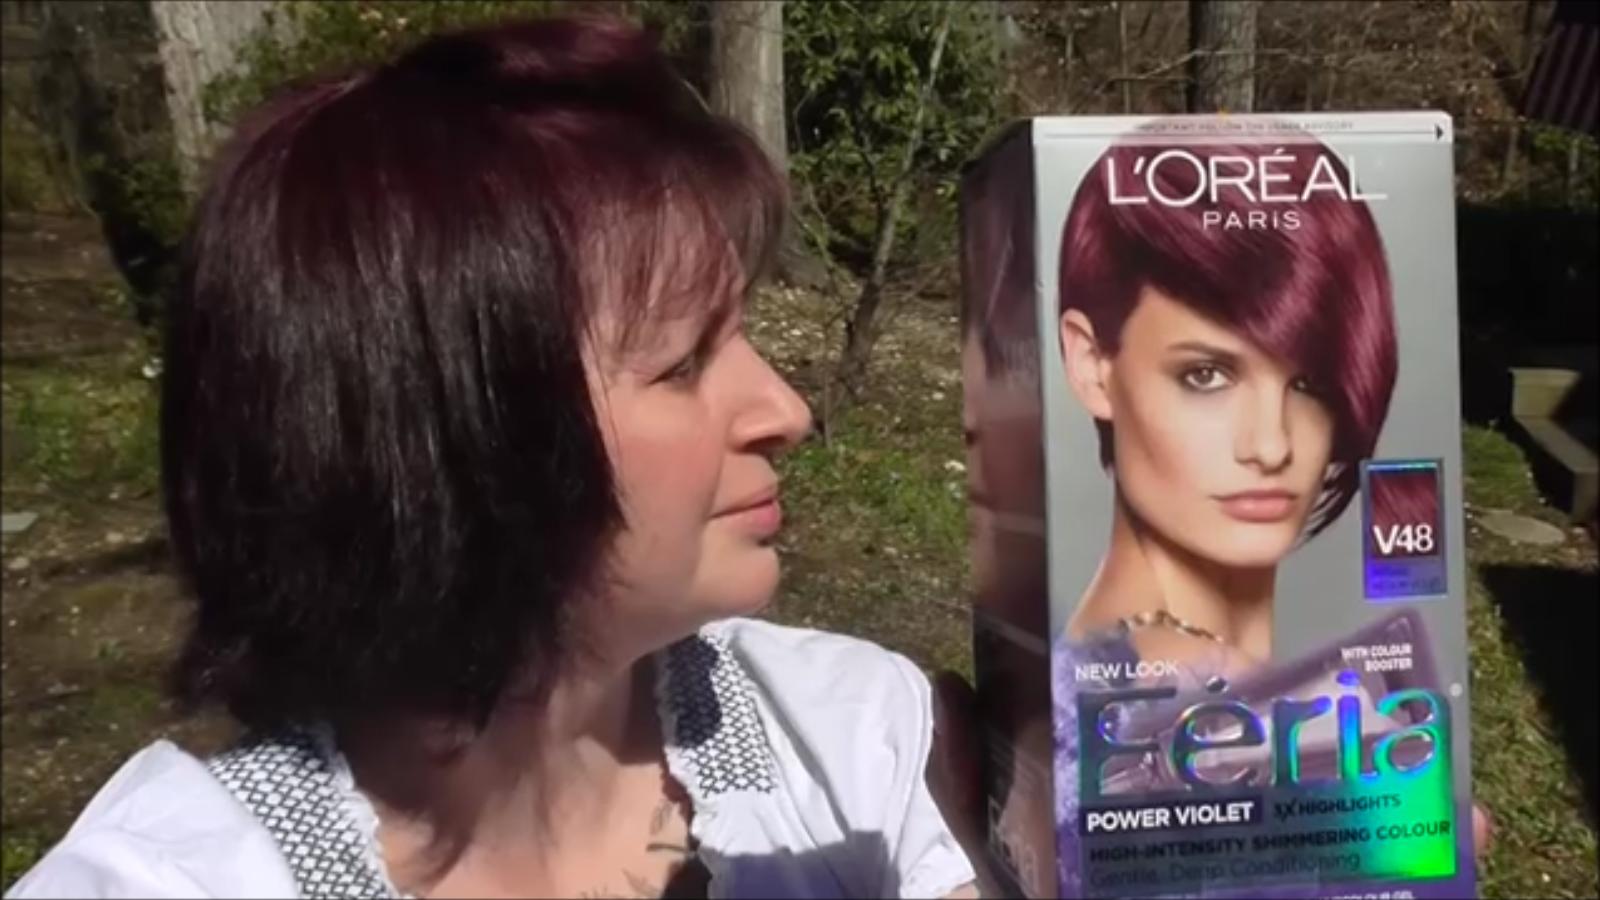 Review Feria Power Violet Intense Medium Violet V48 Hair Color